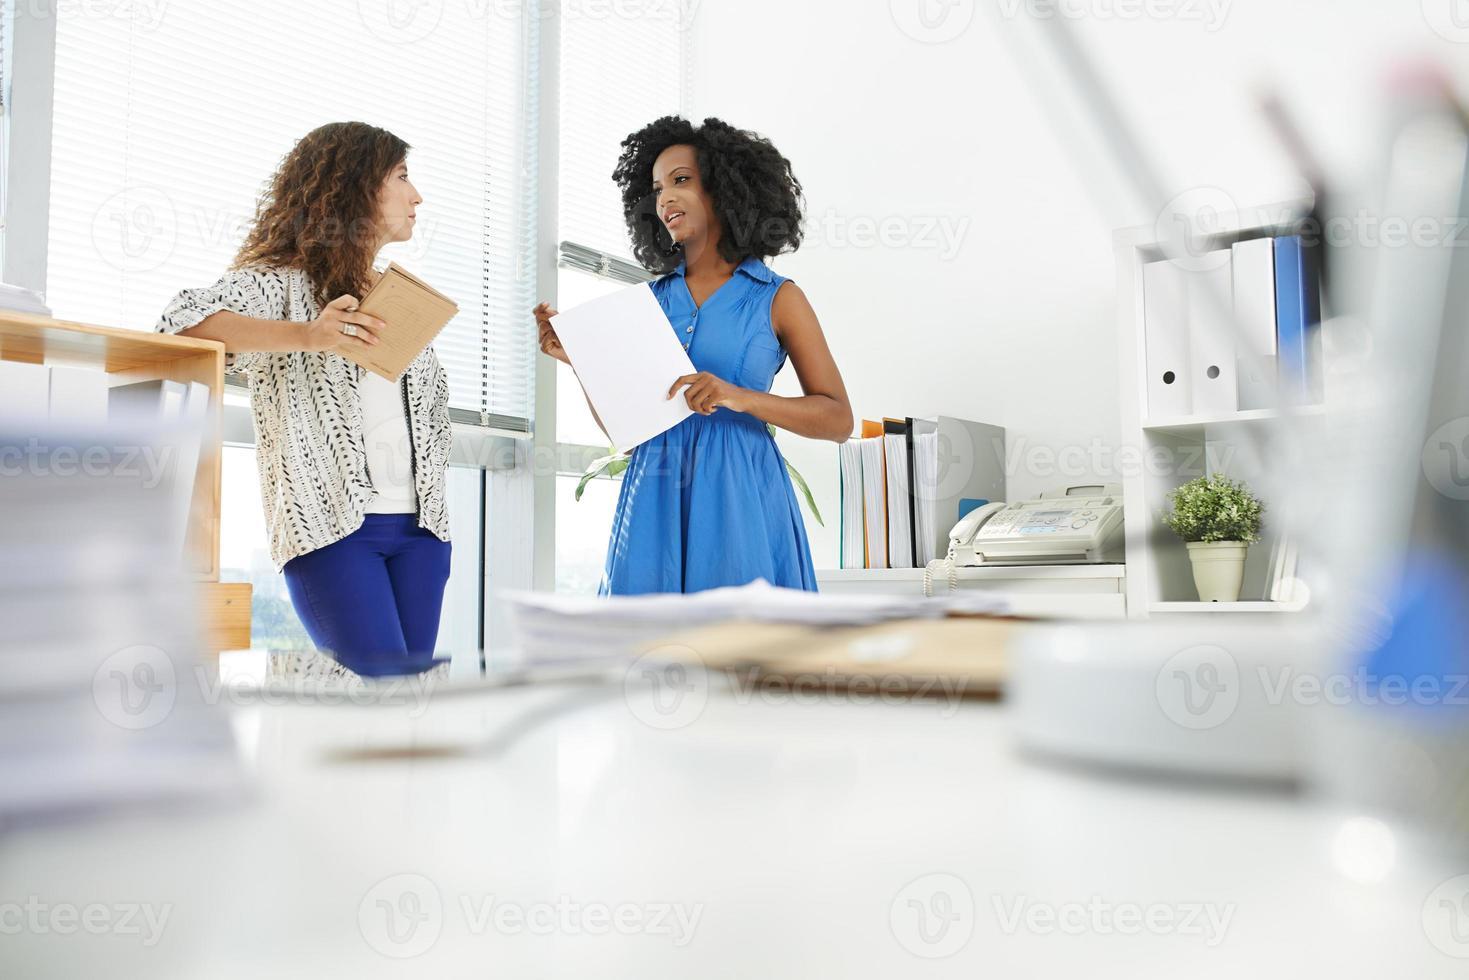 colegas do sexo feminino foto